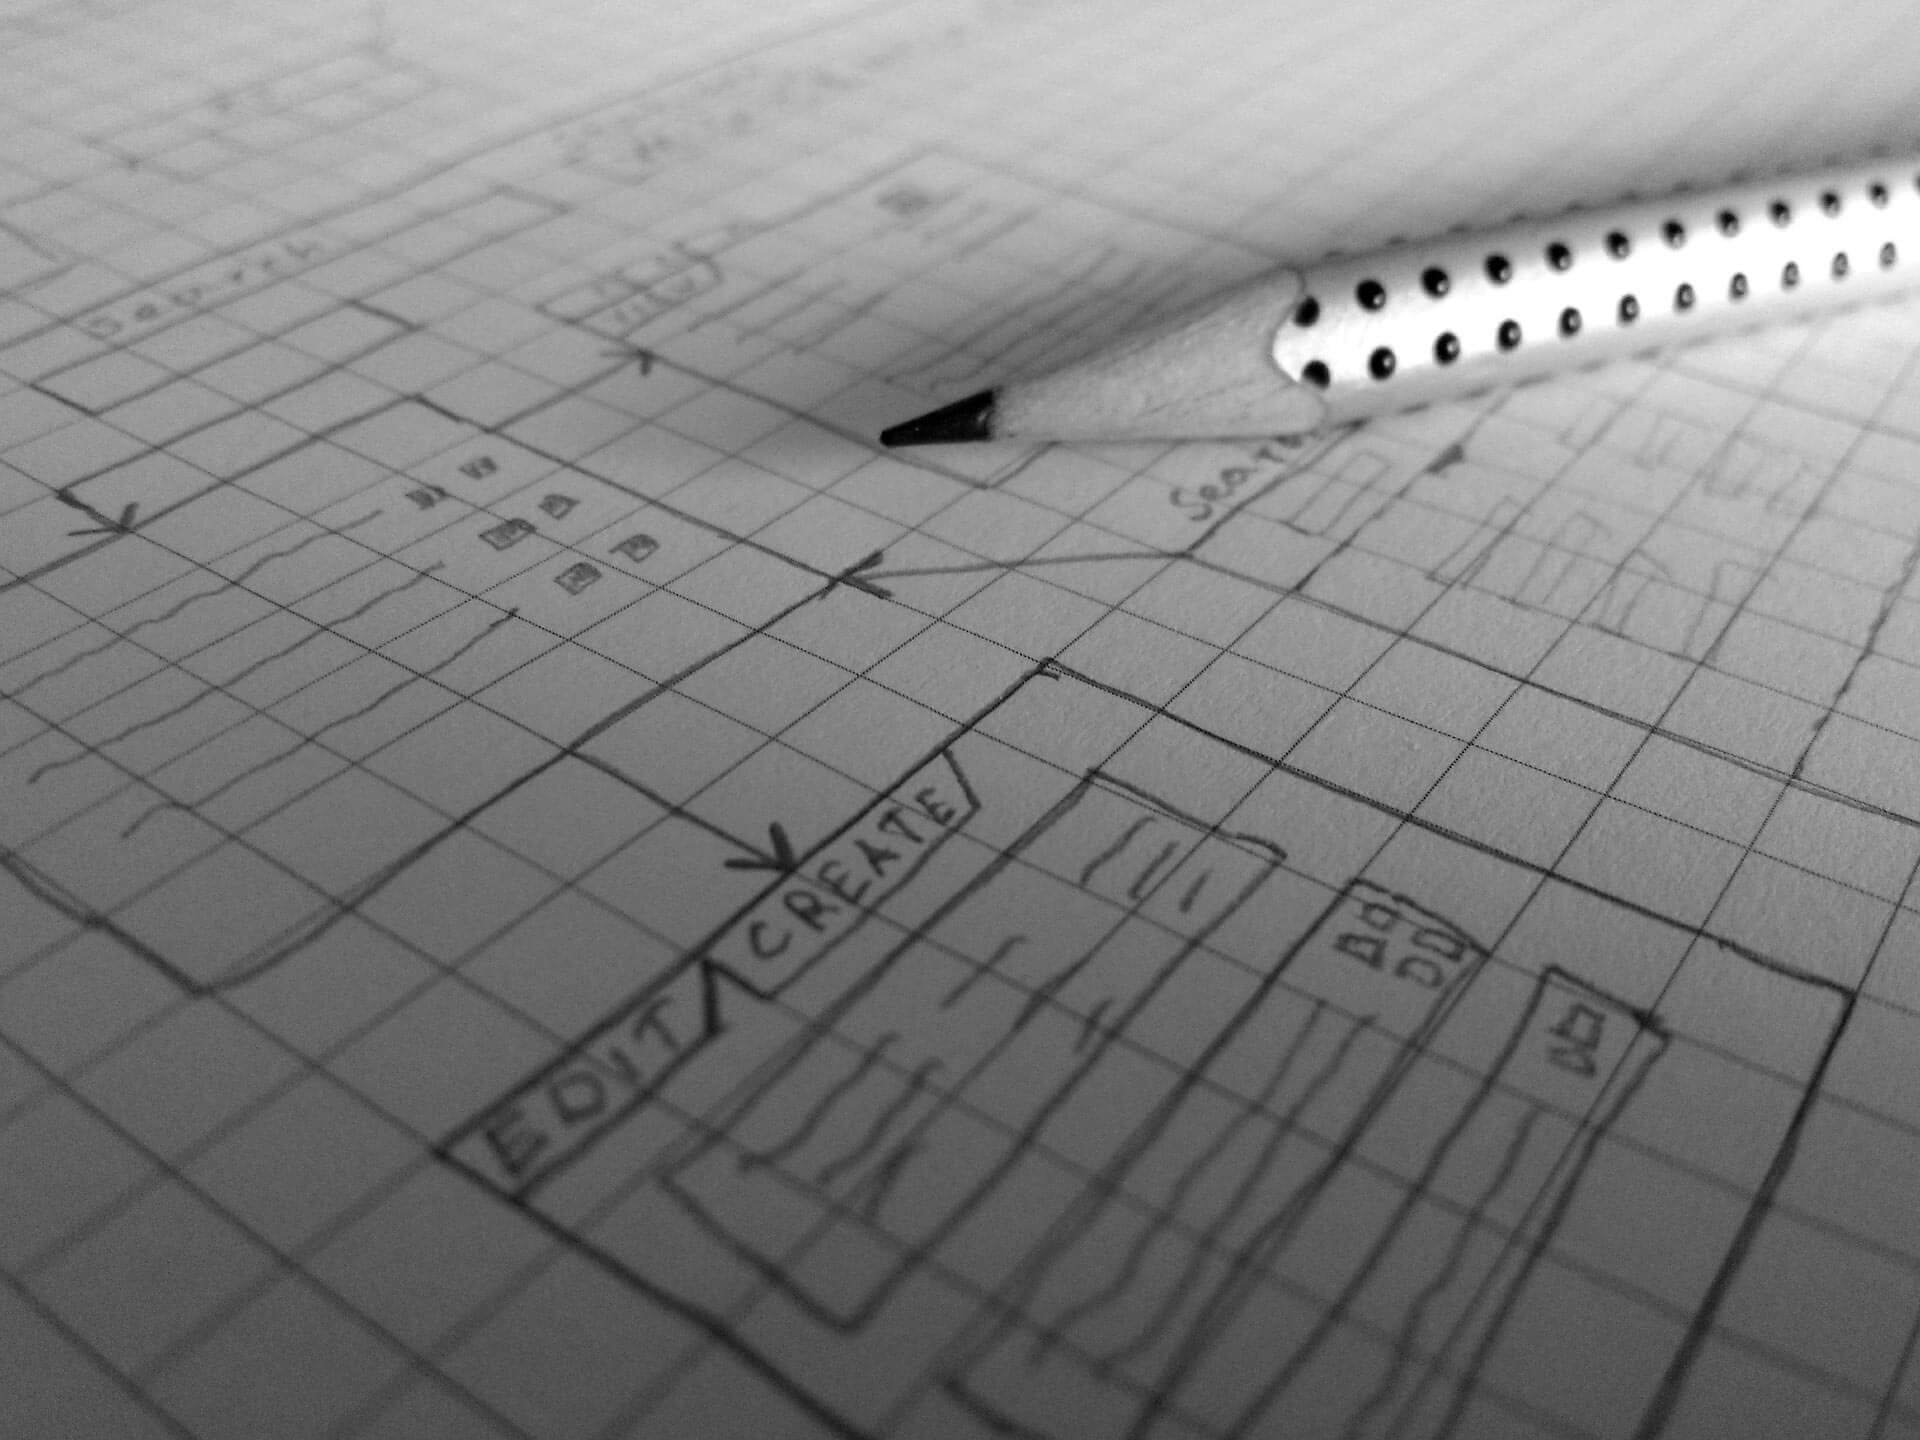 Bleistift auf Papier Planung Software